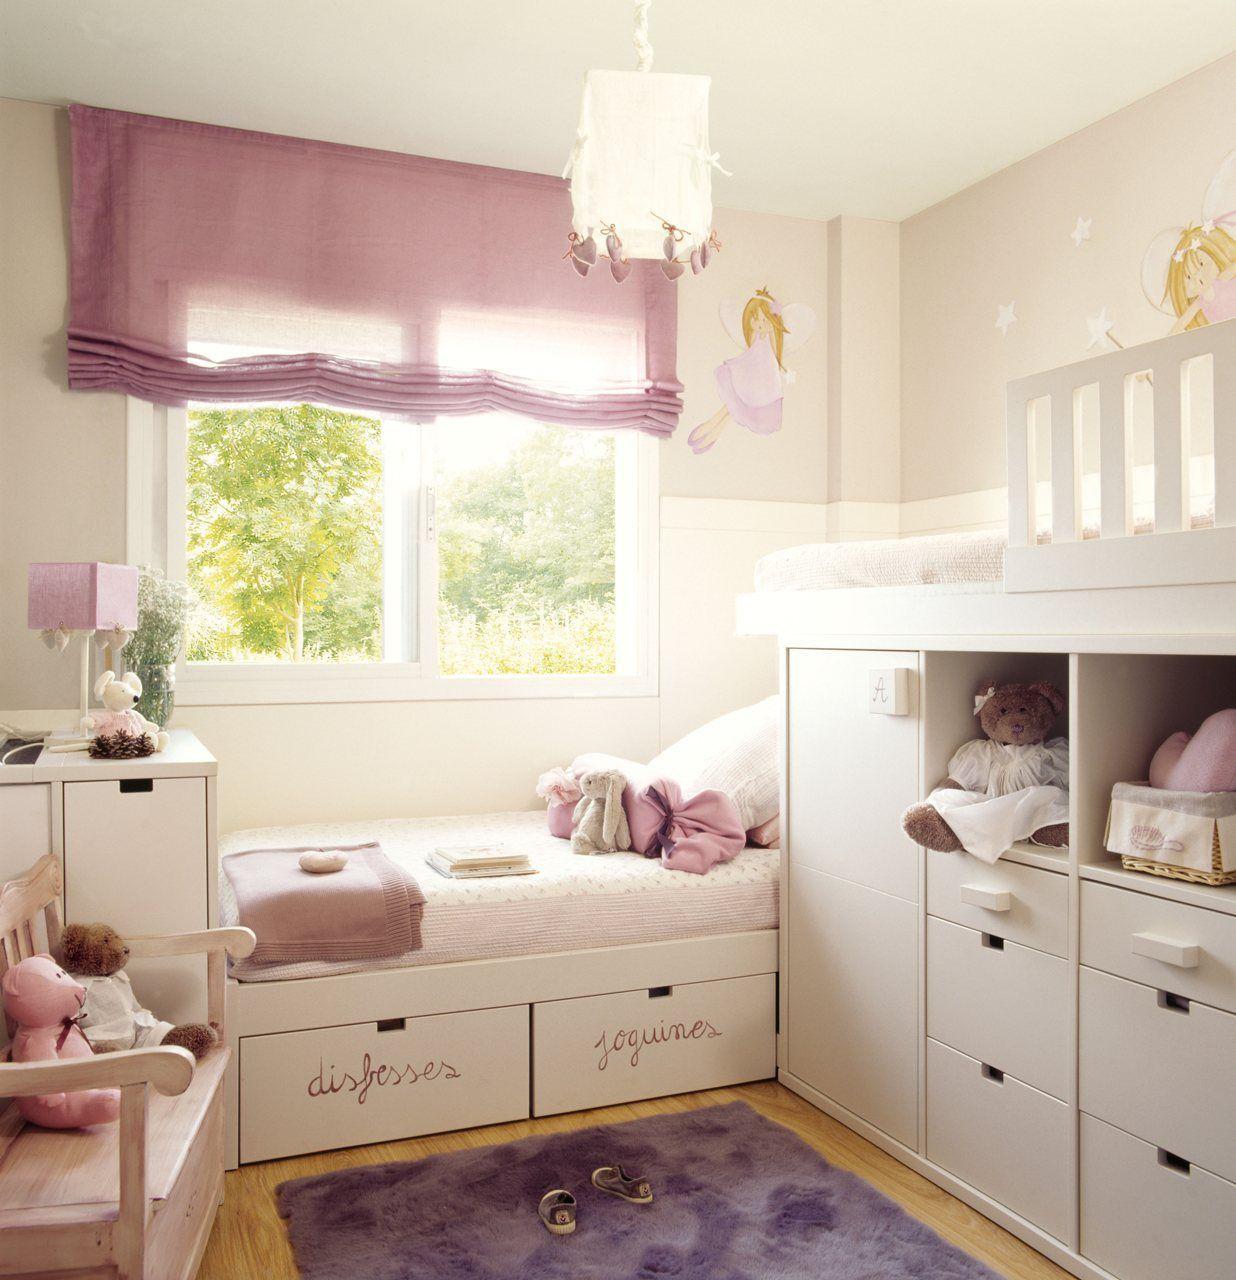 Dormitorios infantiles peque os s cales partido - Dormitorios infantiles blancos ...